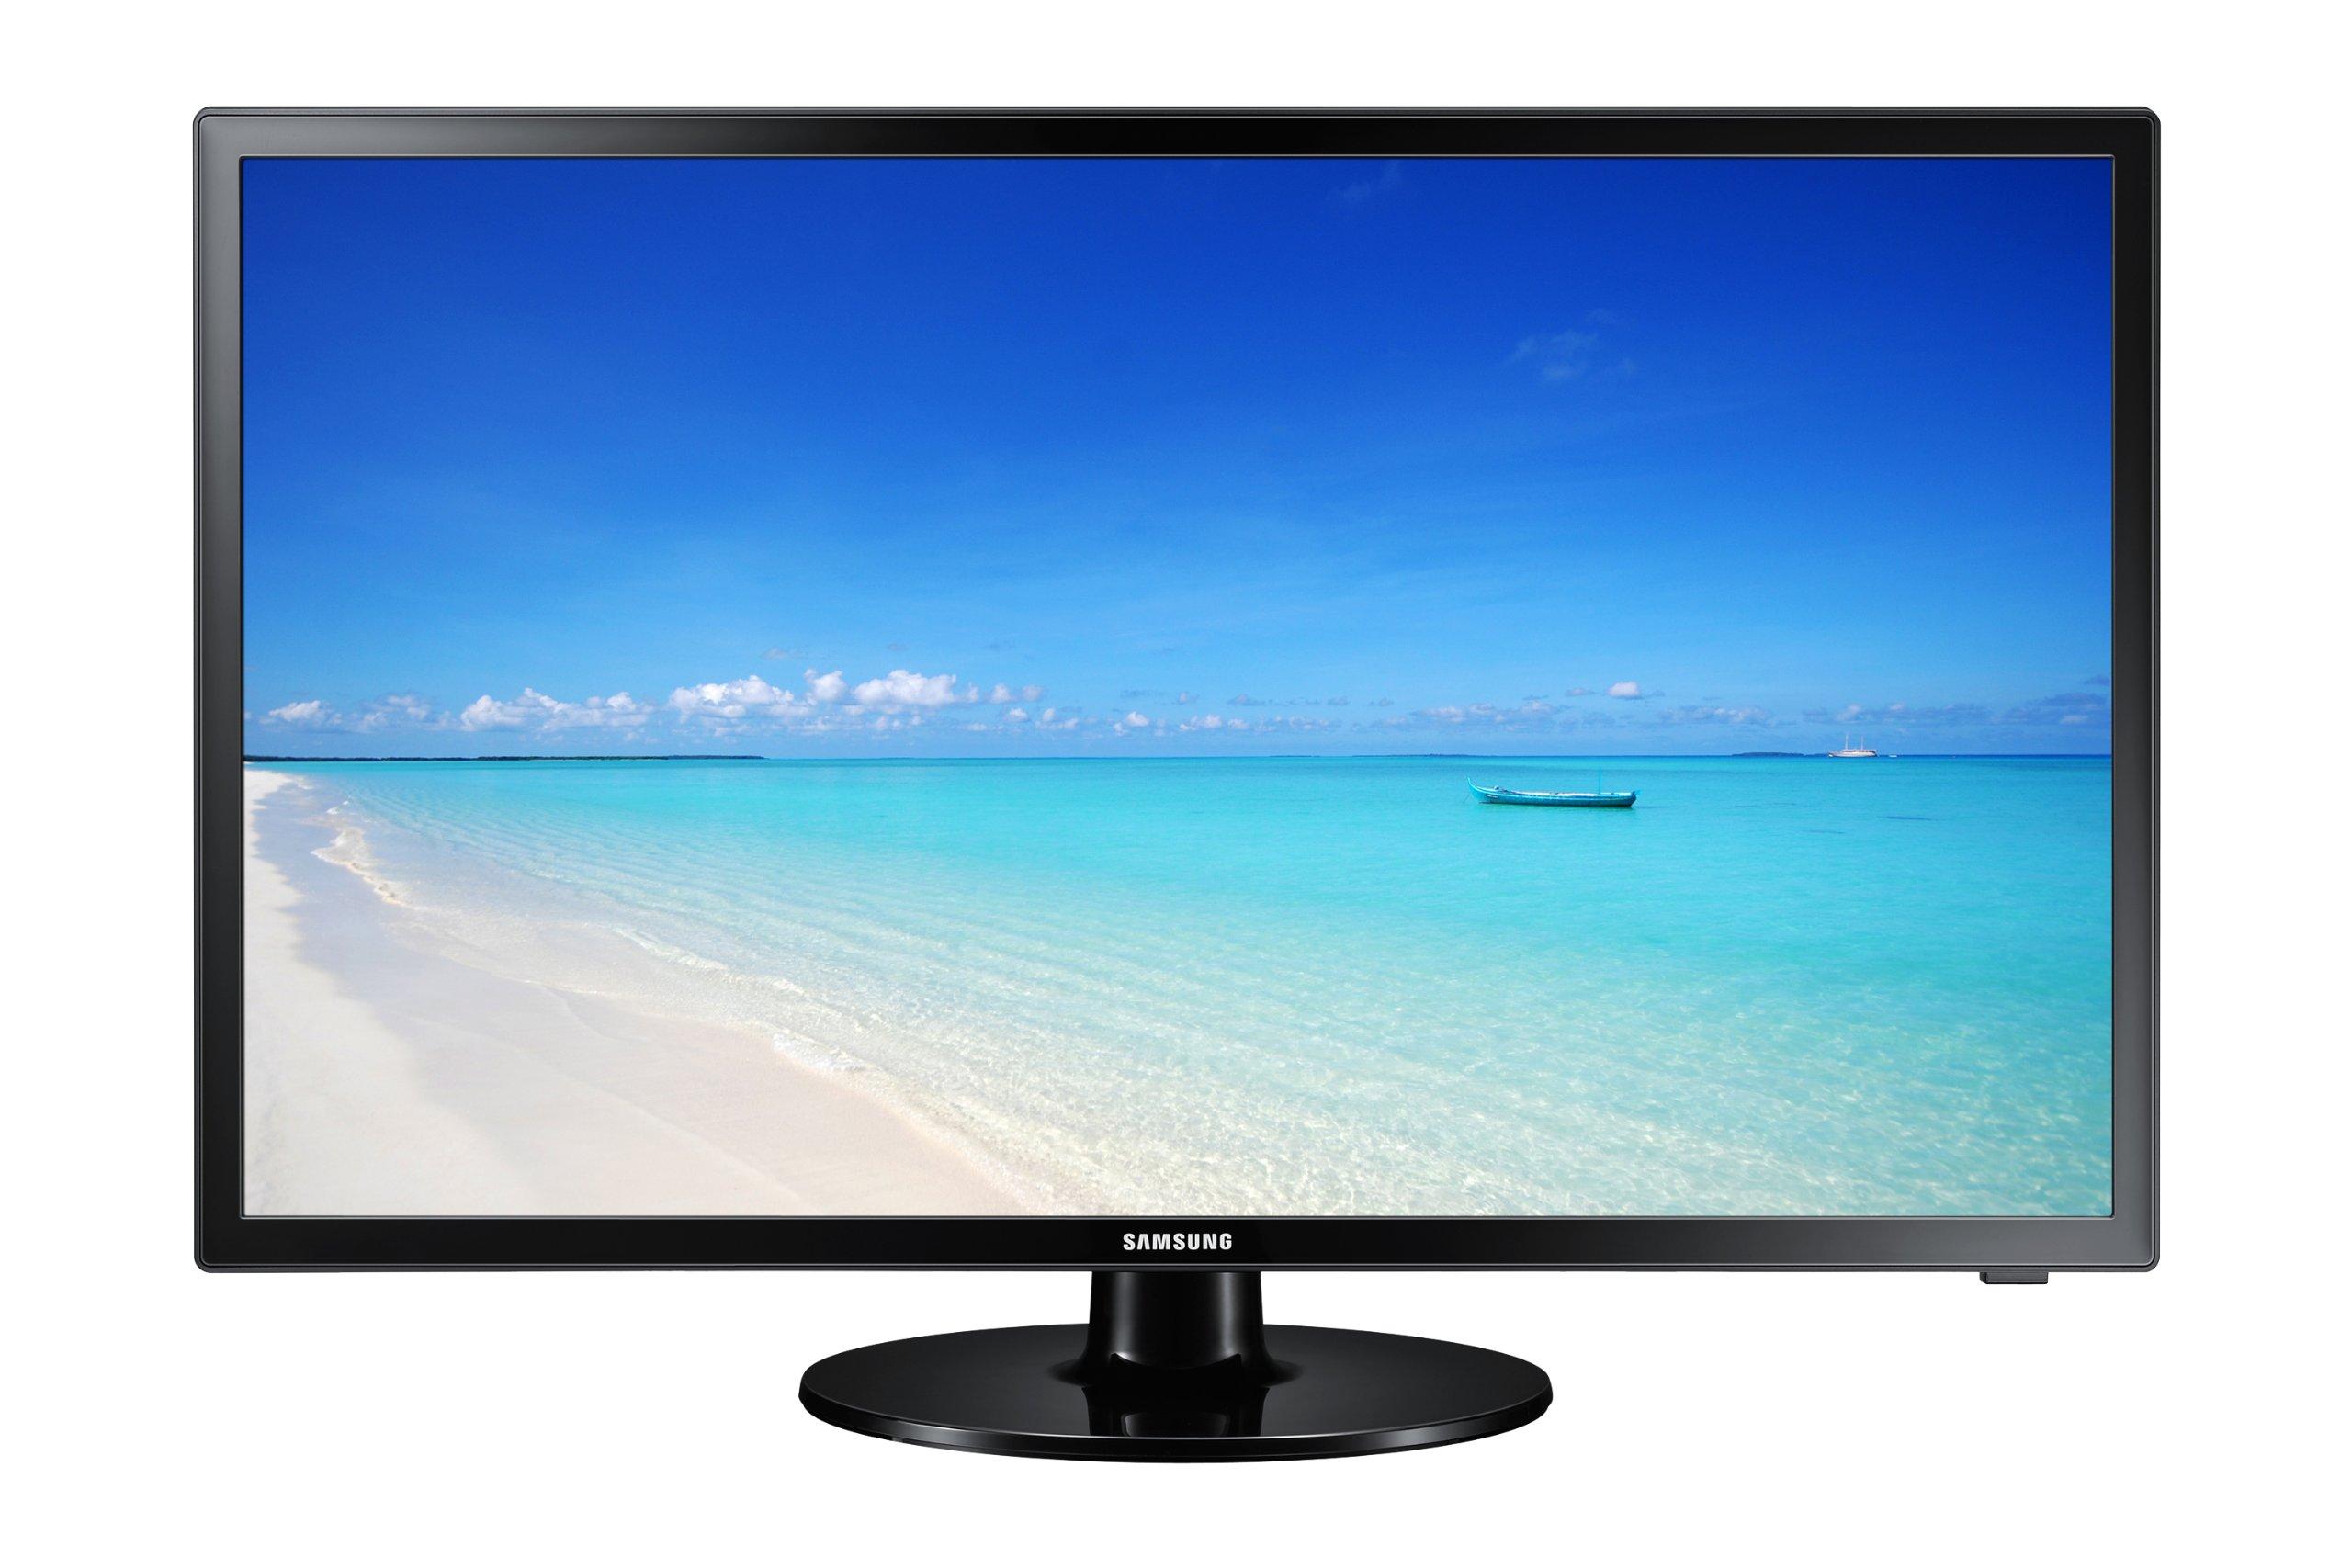 Samsung HG28EB670BWXXC - Televisor LED de 28